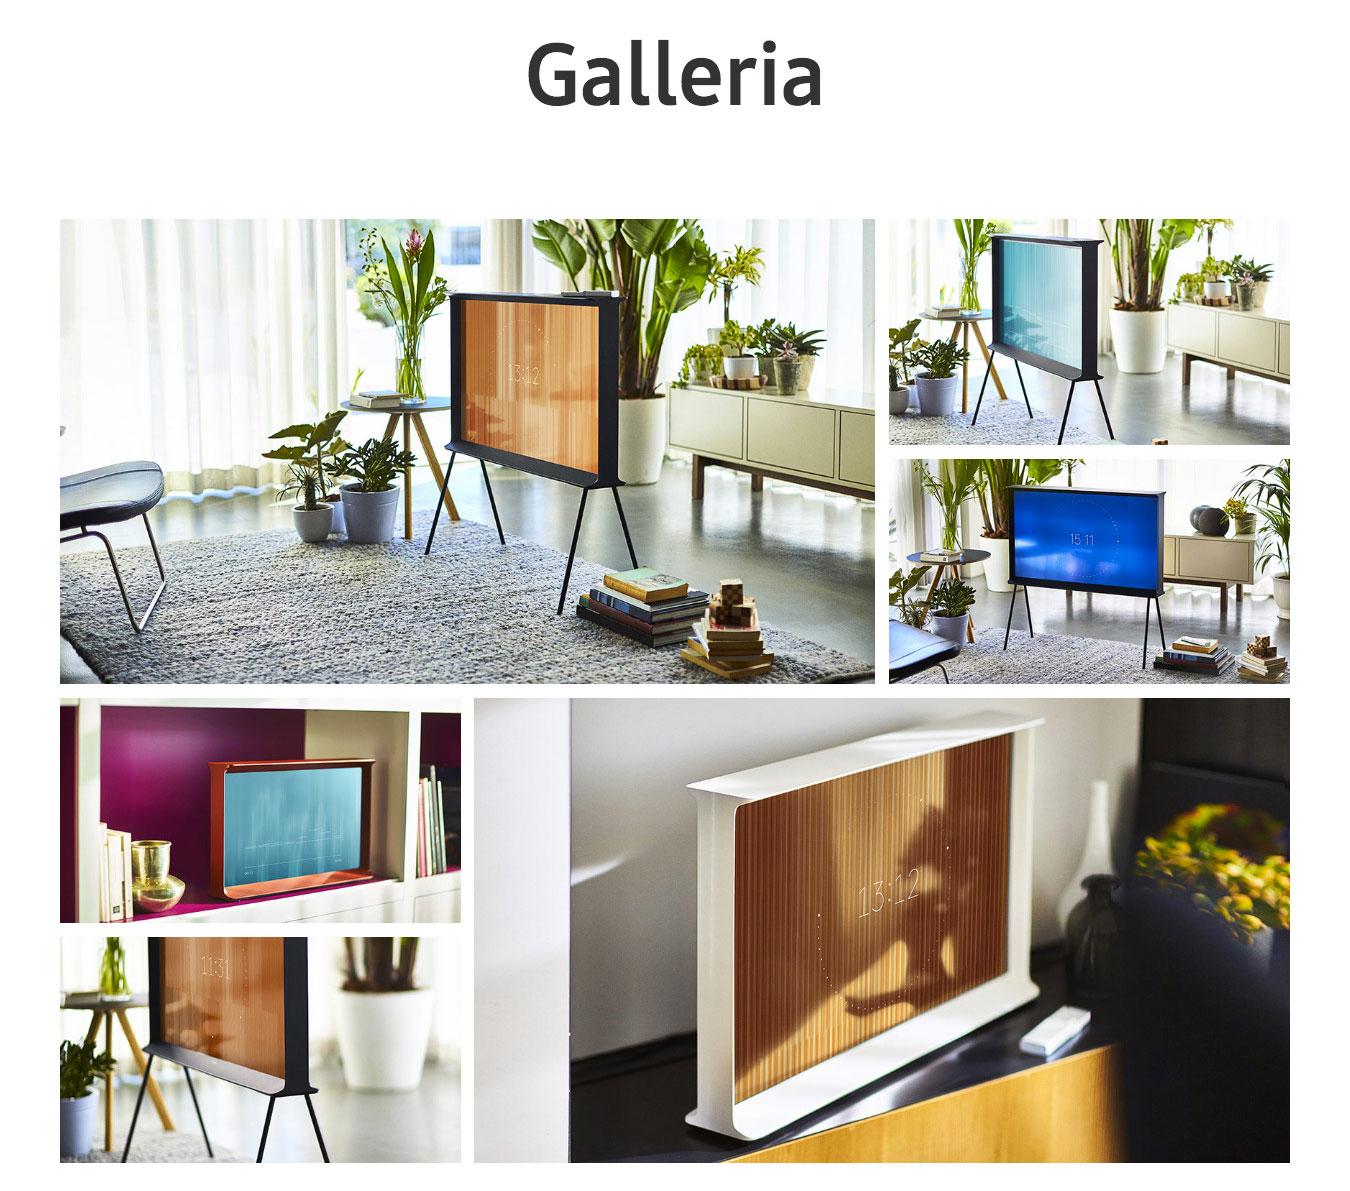 Samsung-Serif-Galleria.jpg